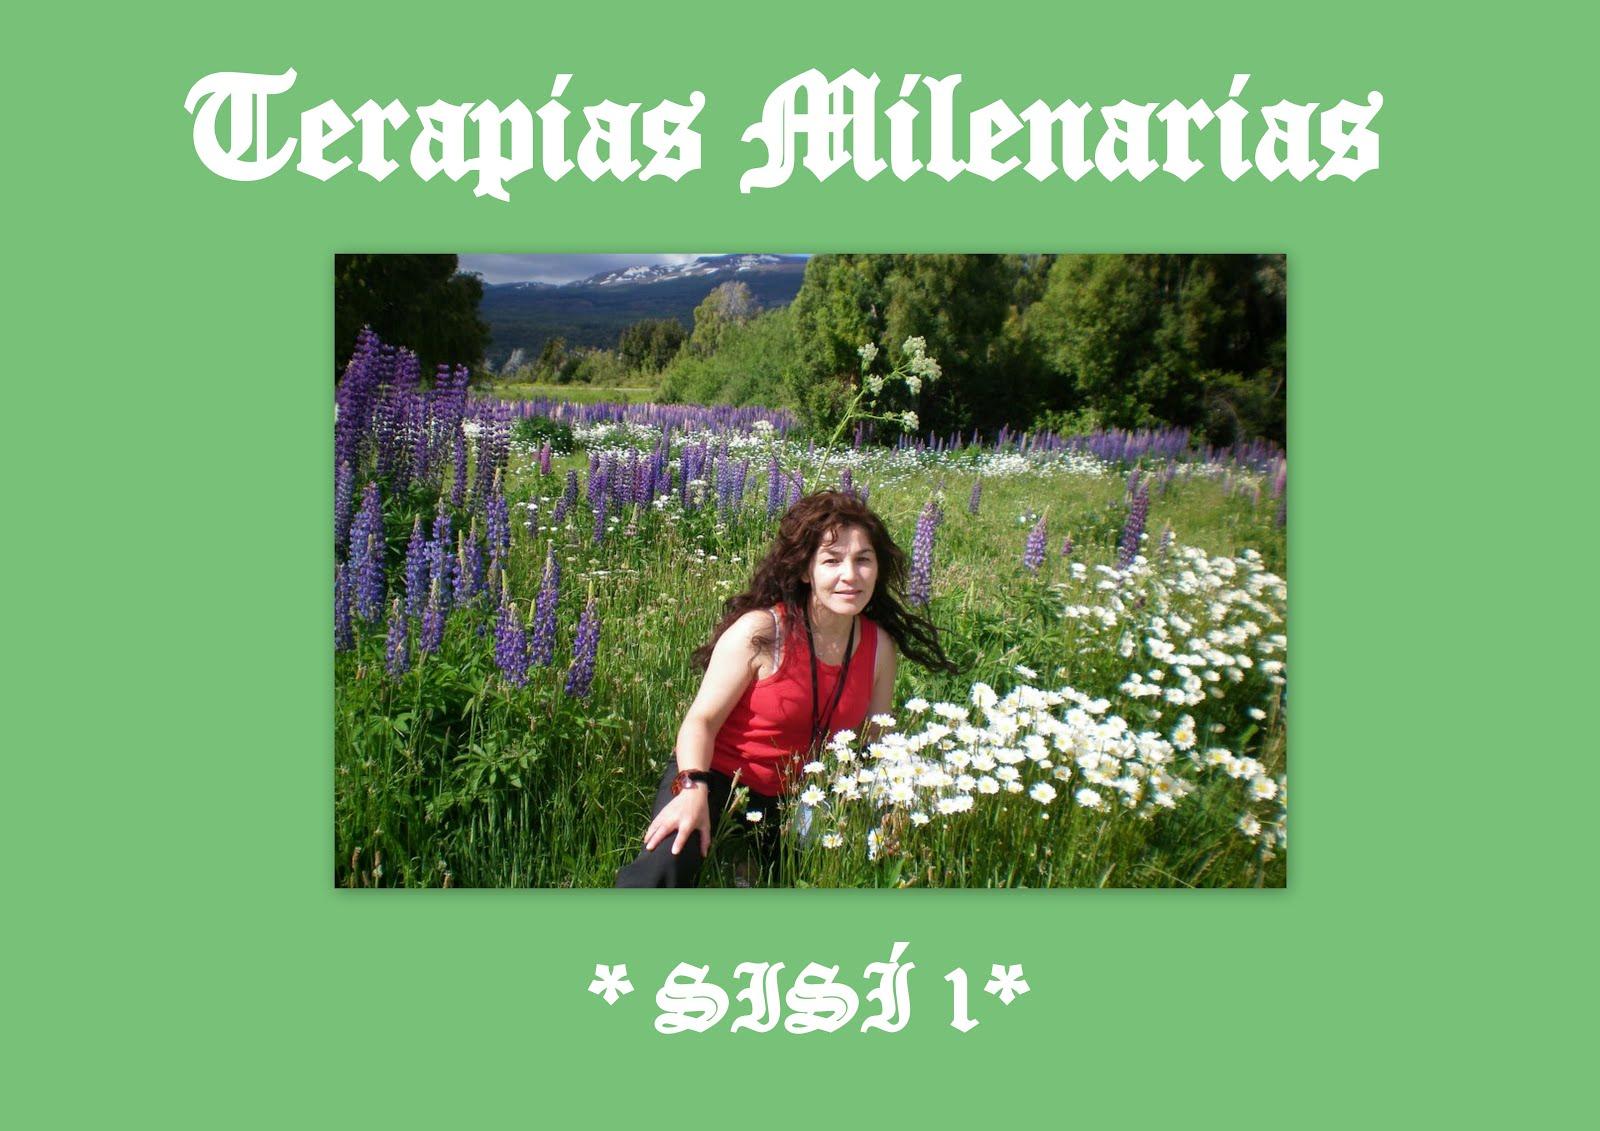 TERAPIAS MILENARIAS